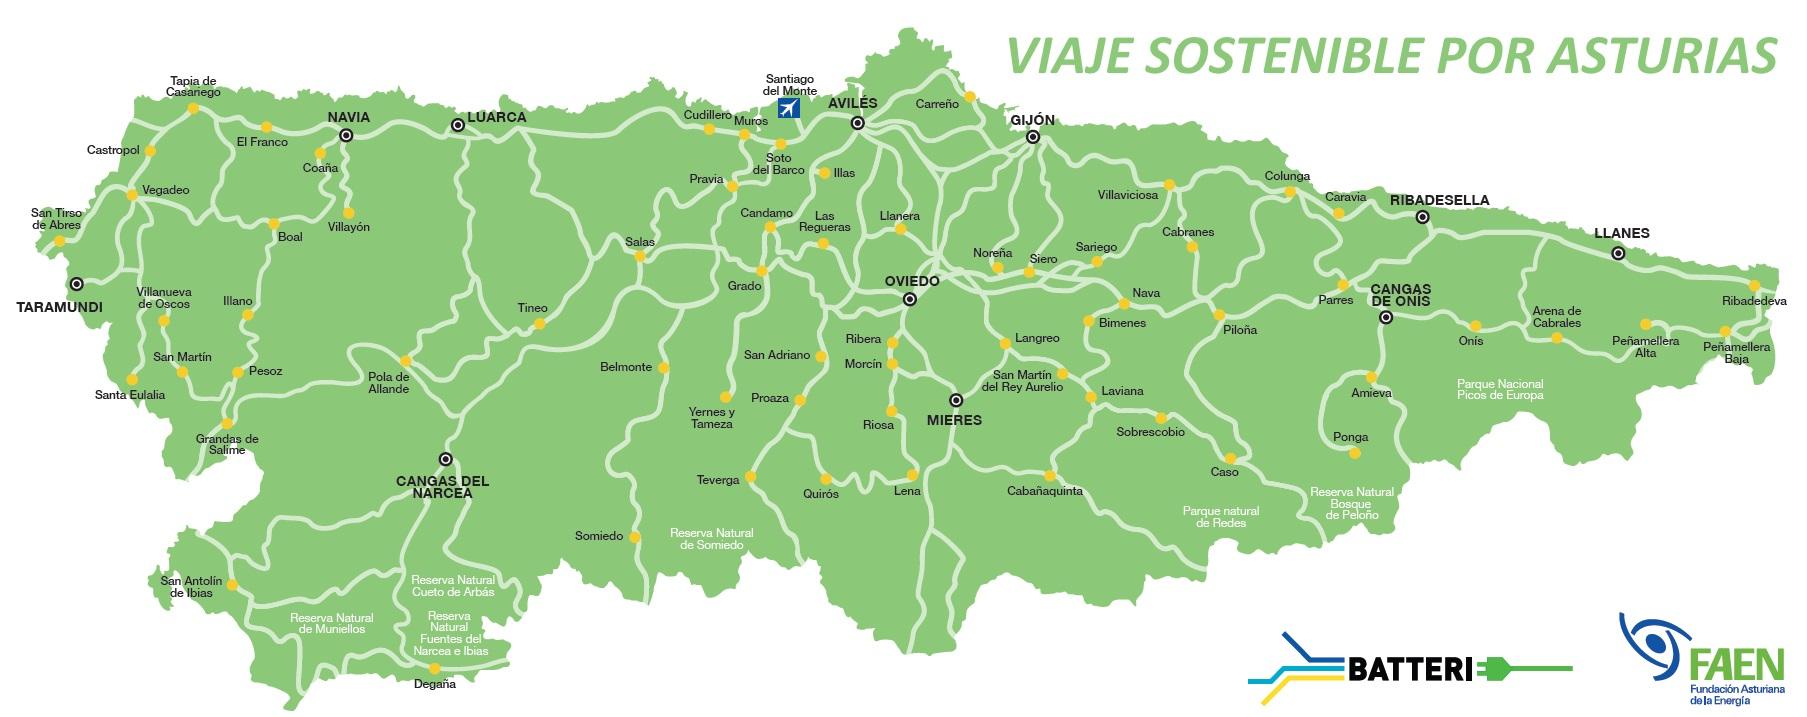 Mapa De Asturias Fisico.Mapa De Asturias Mapa Fisico Geografico Politico